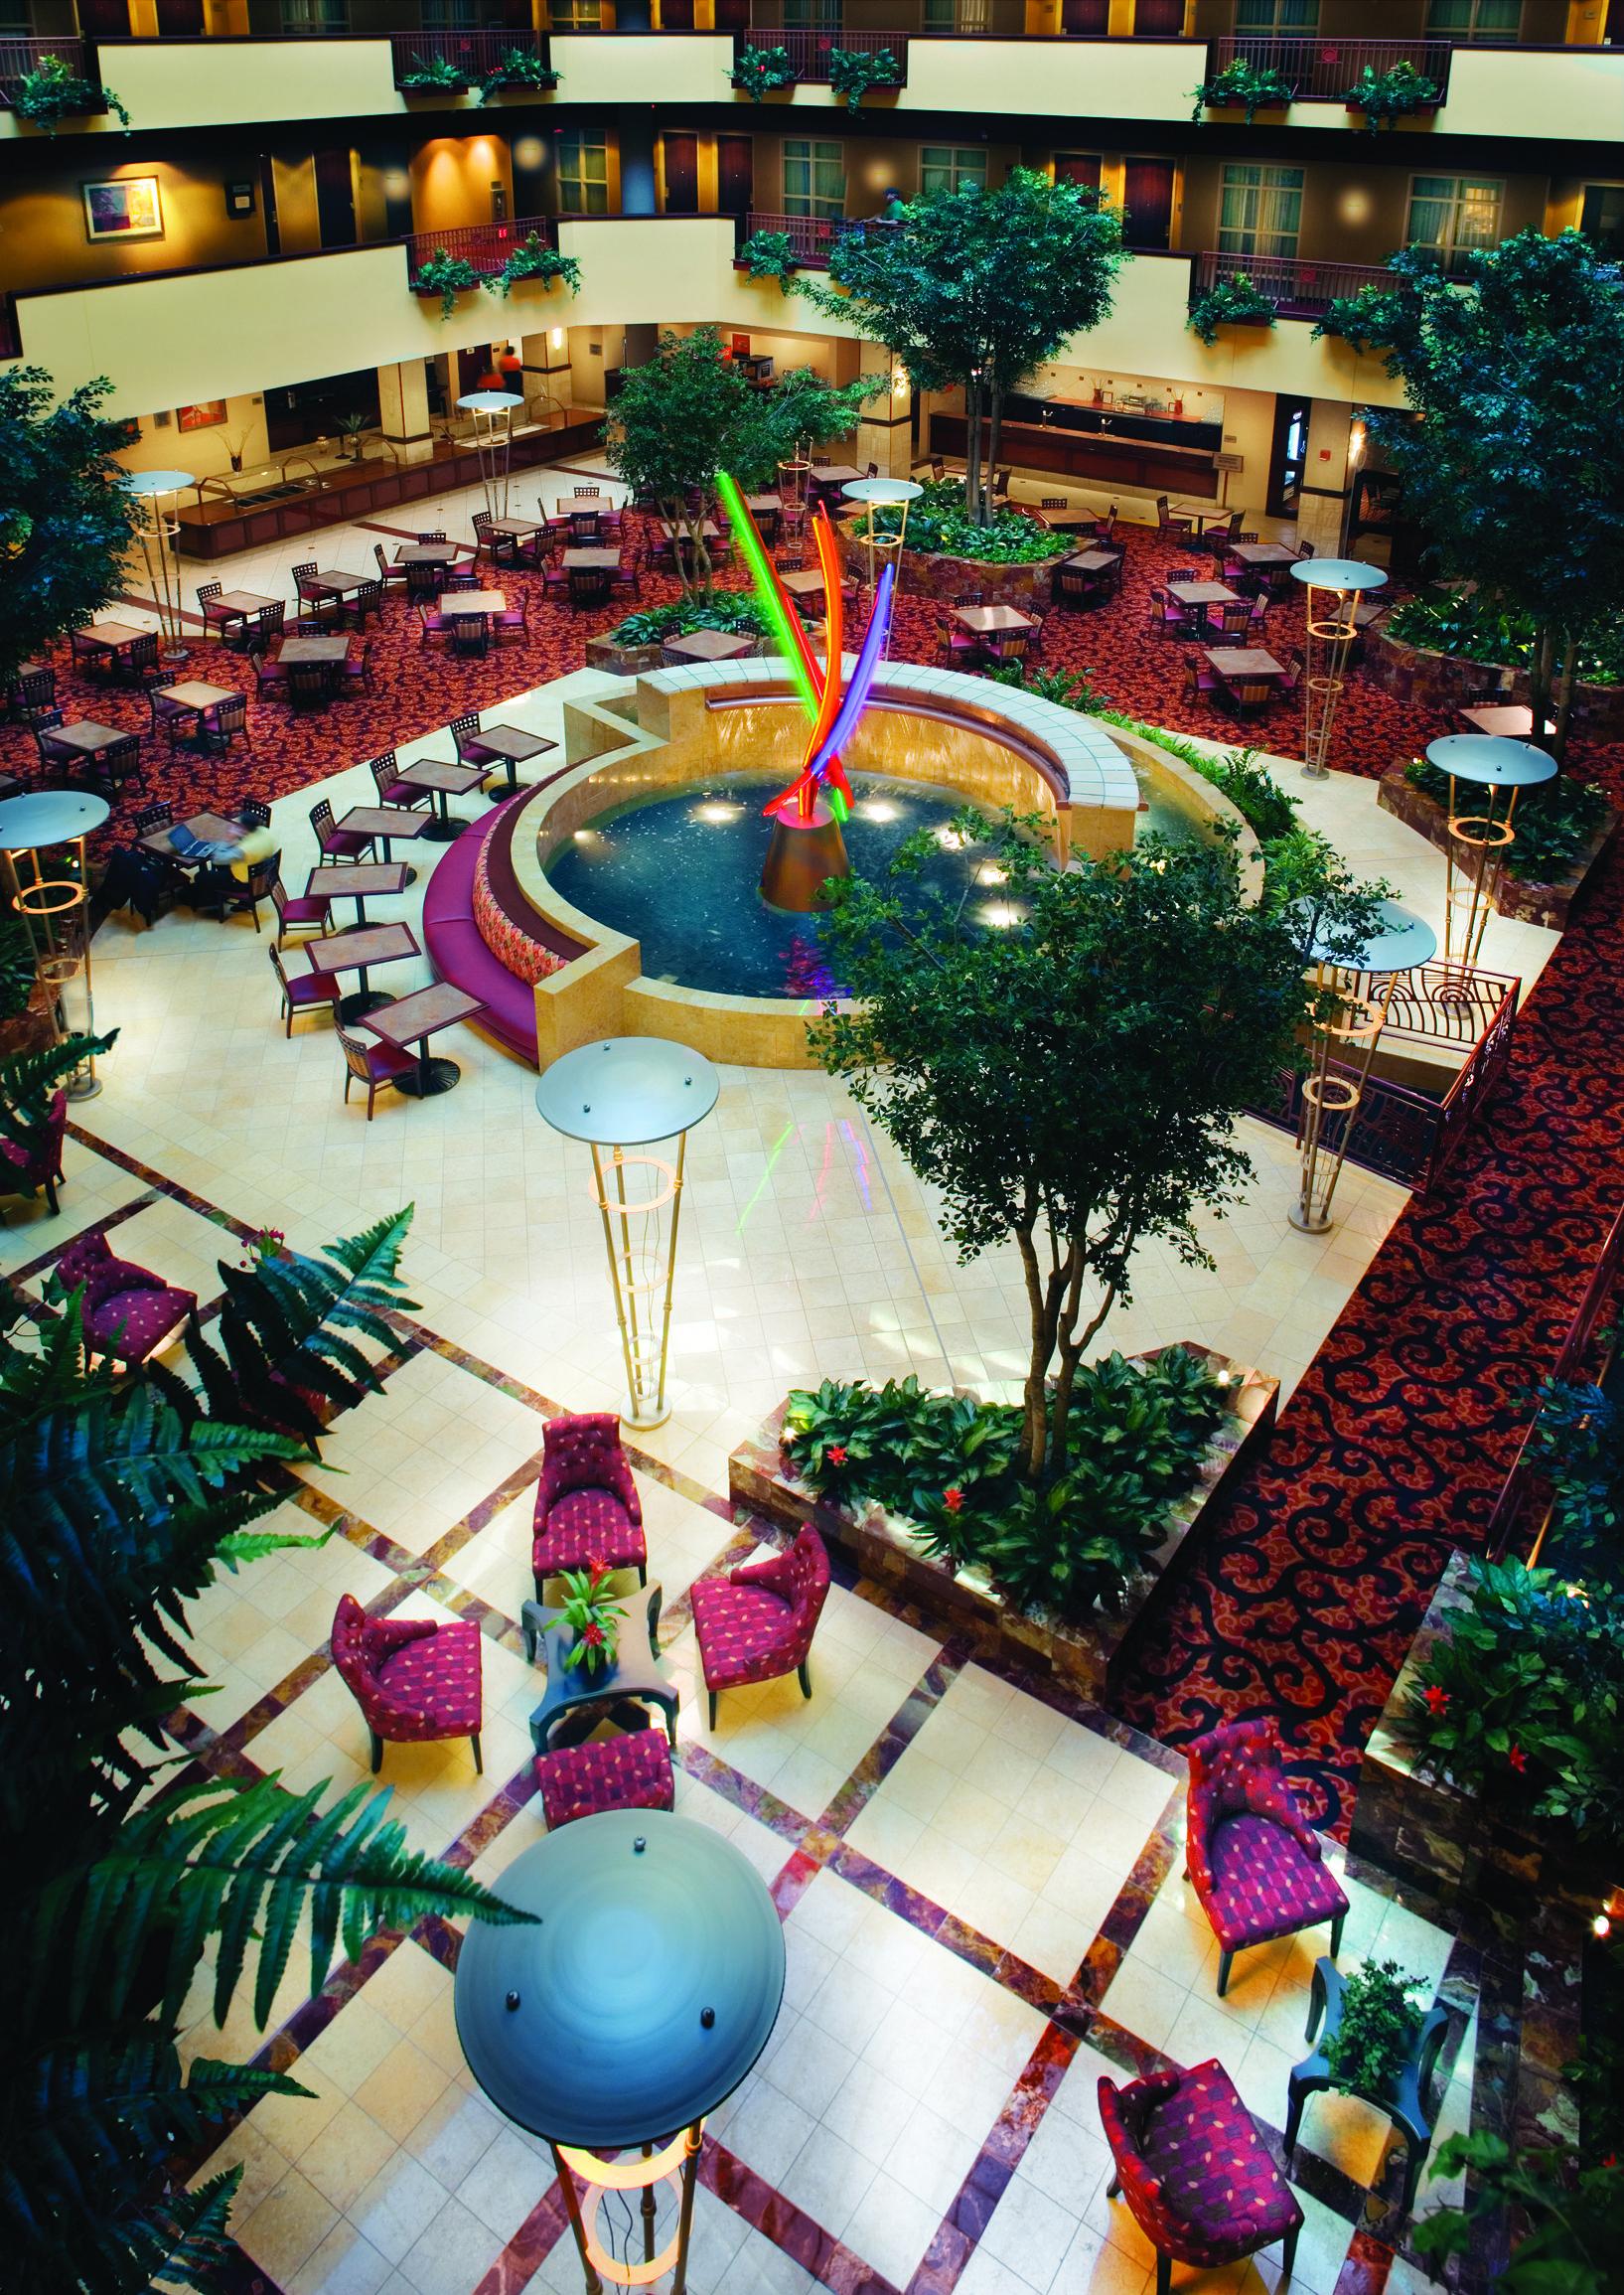 Embassy Suites Charlotte - Concord/Golf Resort & Spa